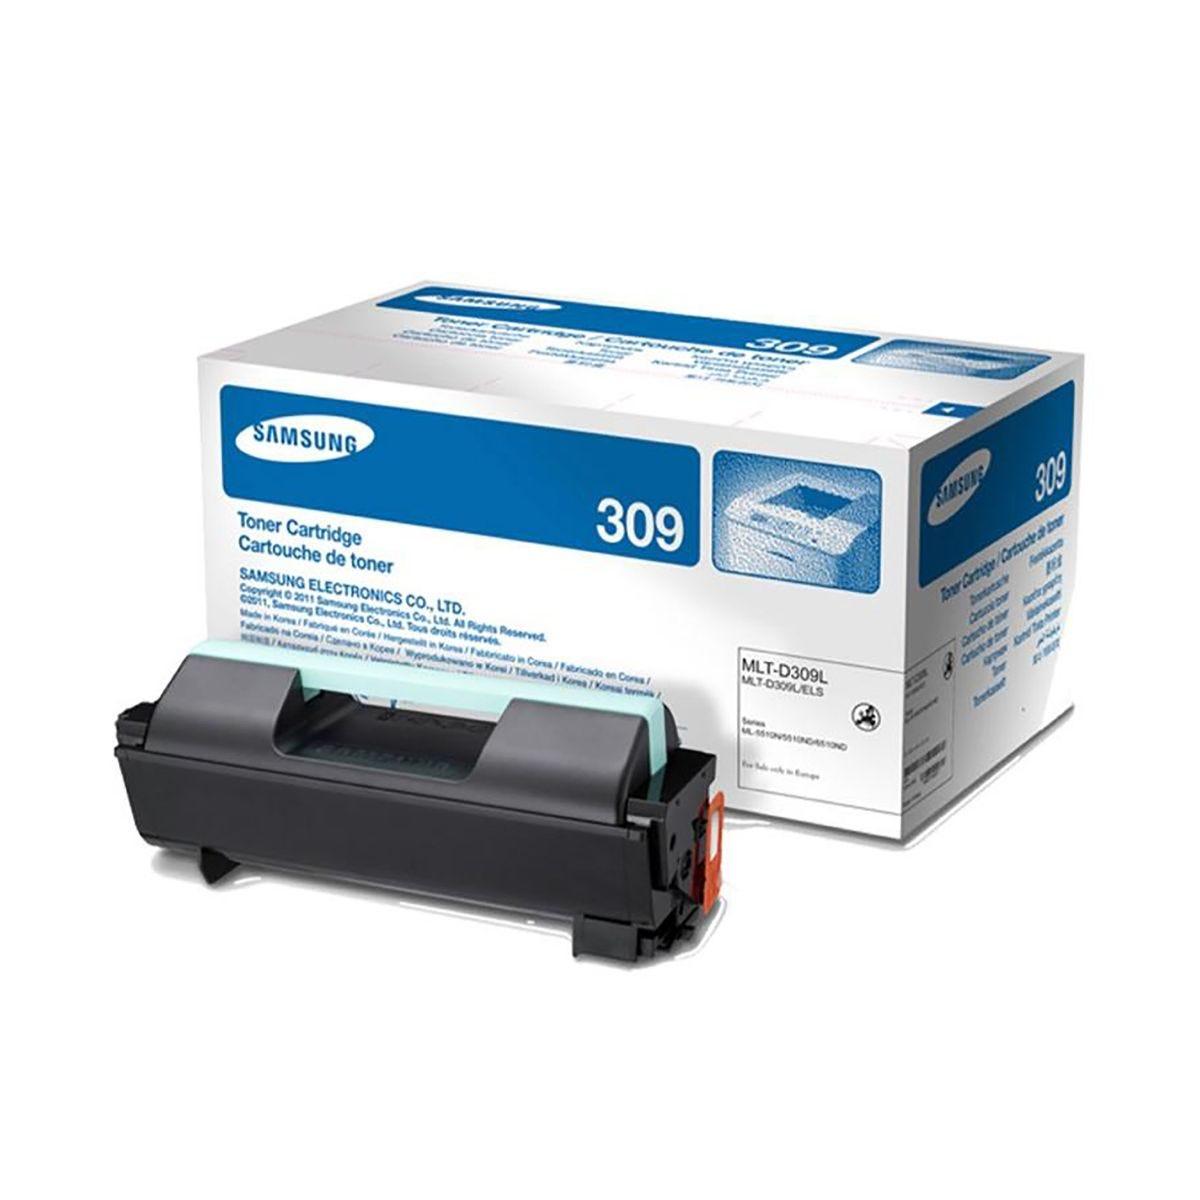 Samsung ML5510ND Toner